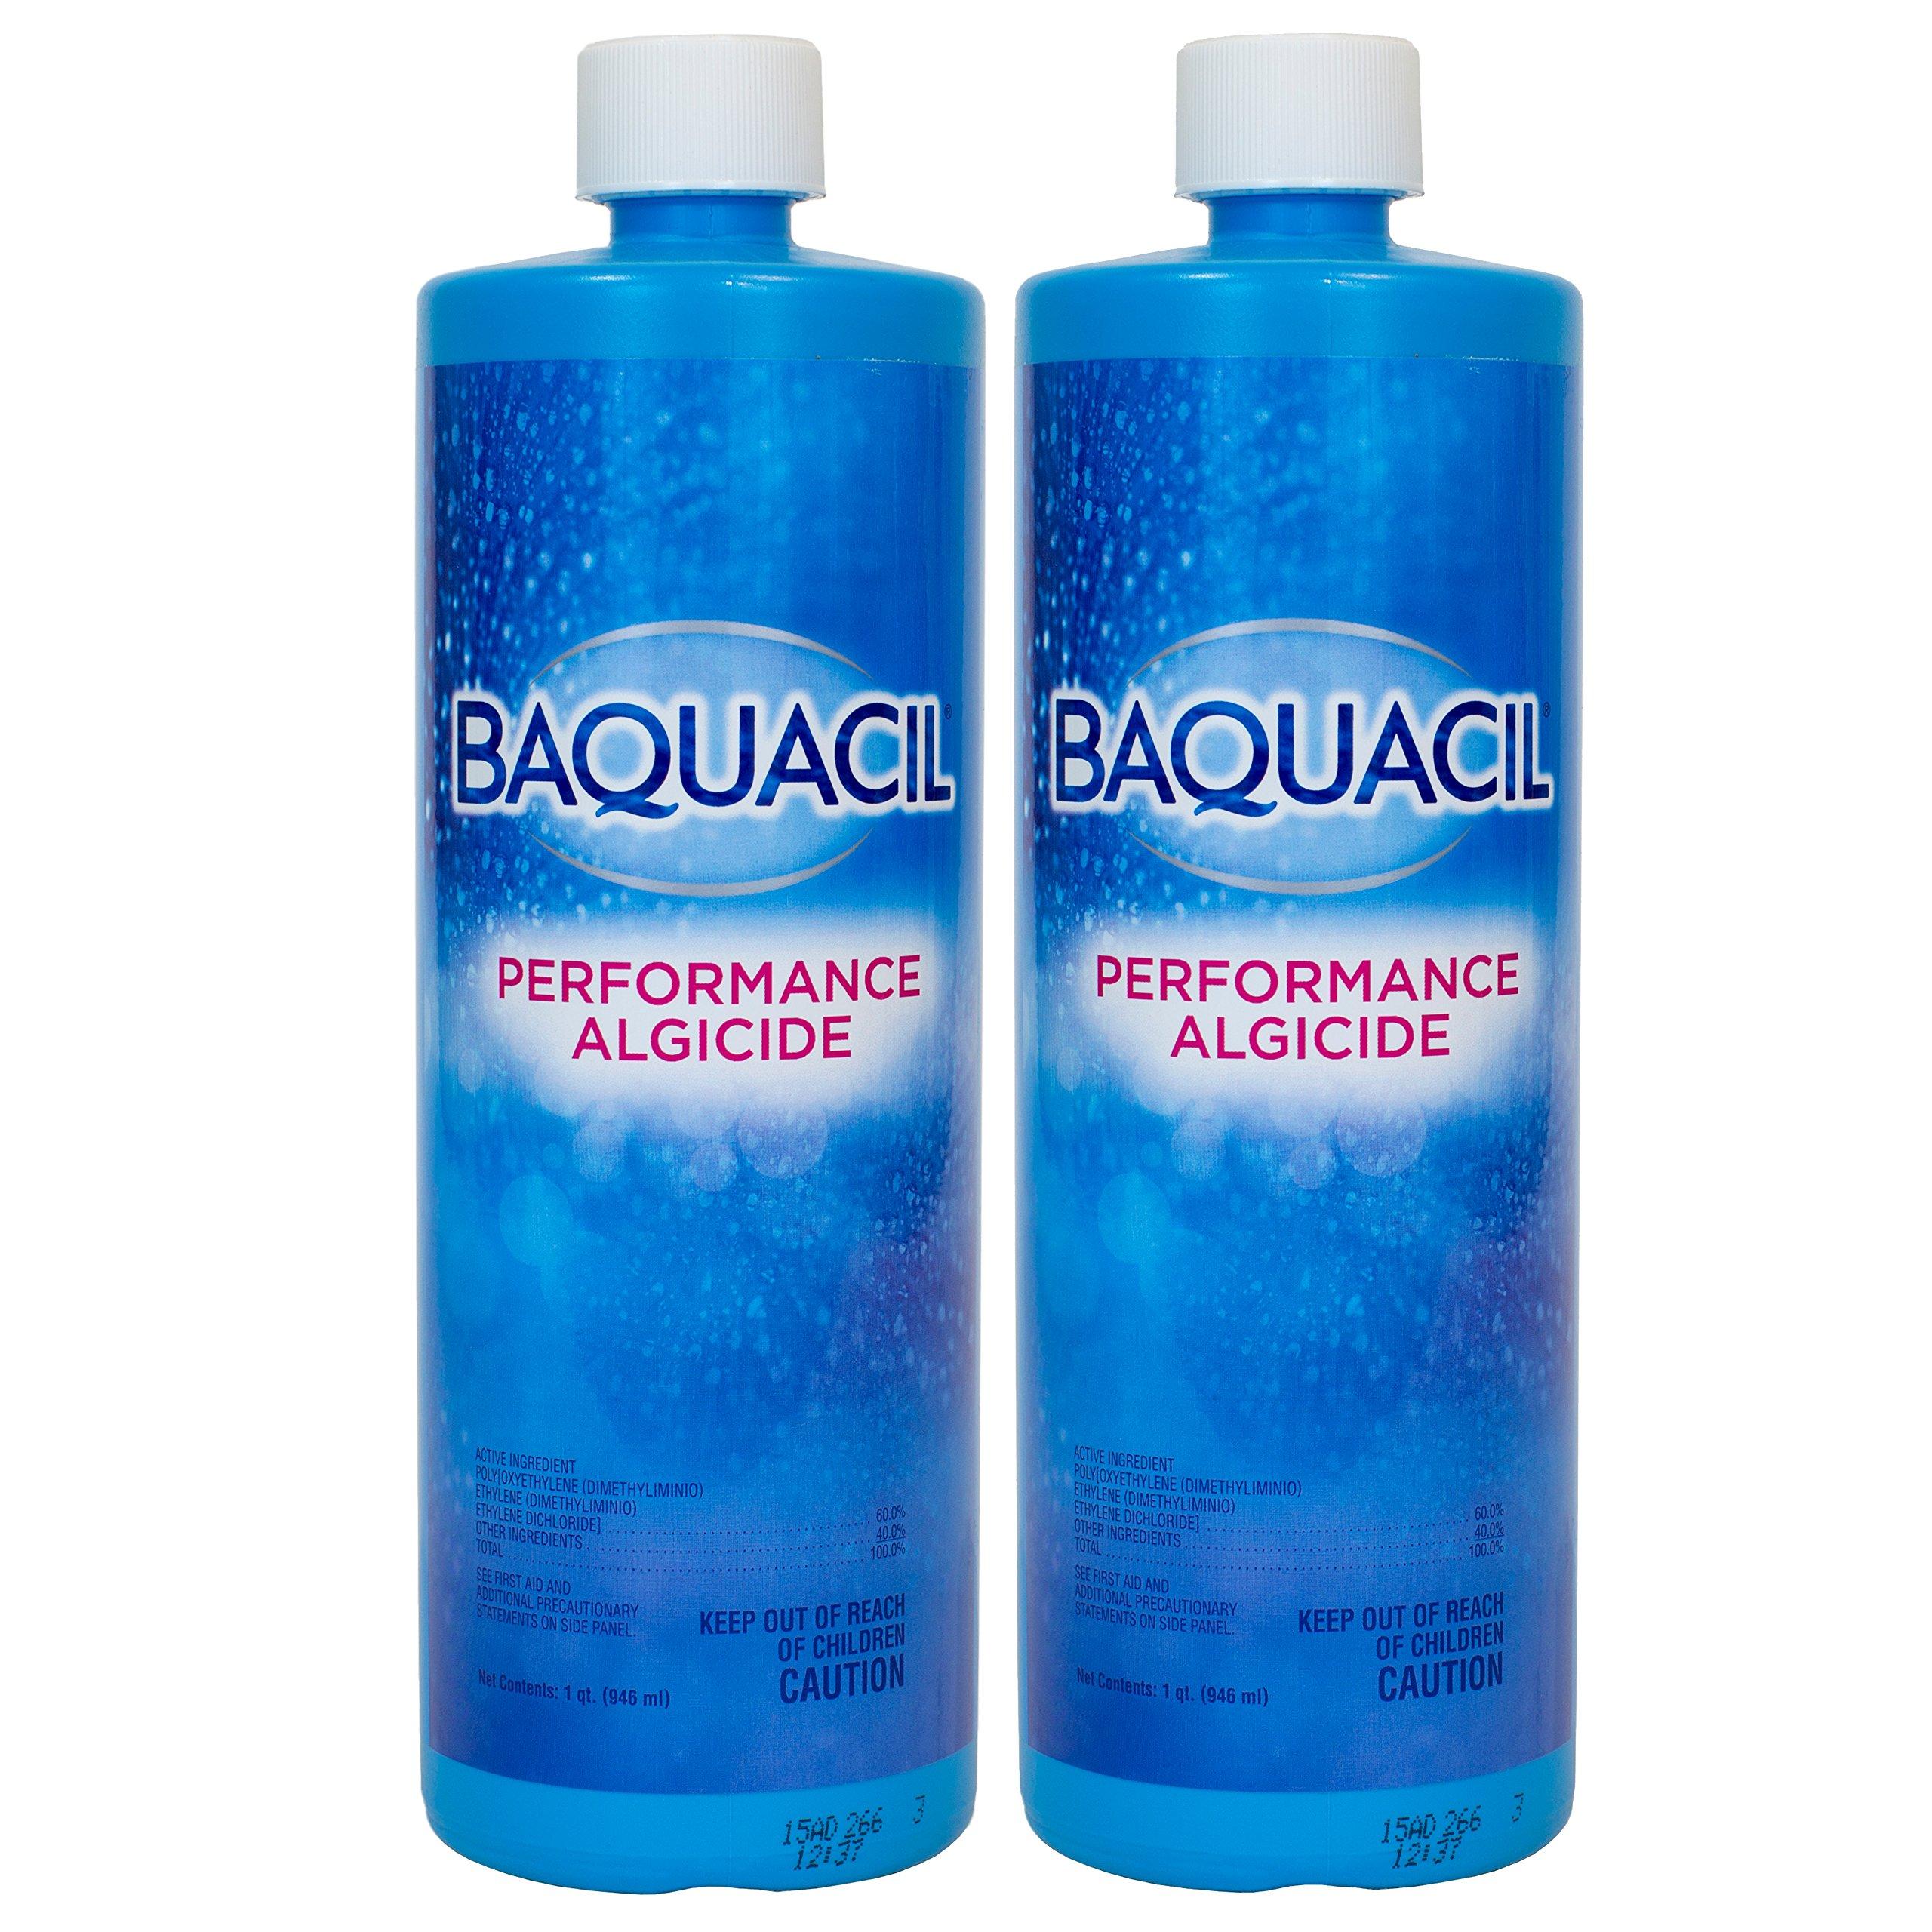 Baquacil Performance Algicide (1 qt) (2 Pack) by Baquacil